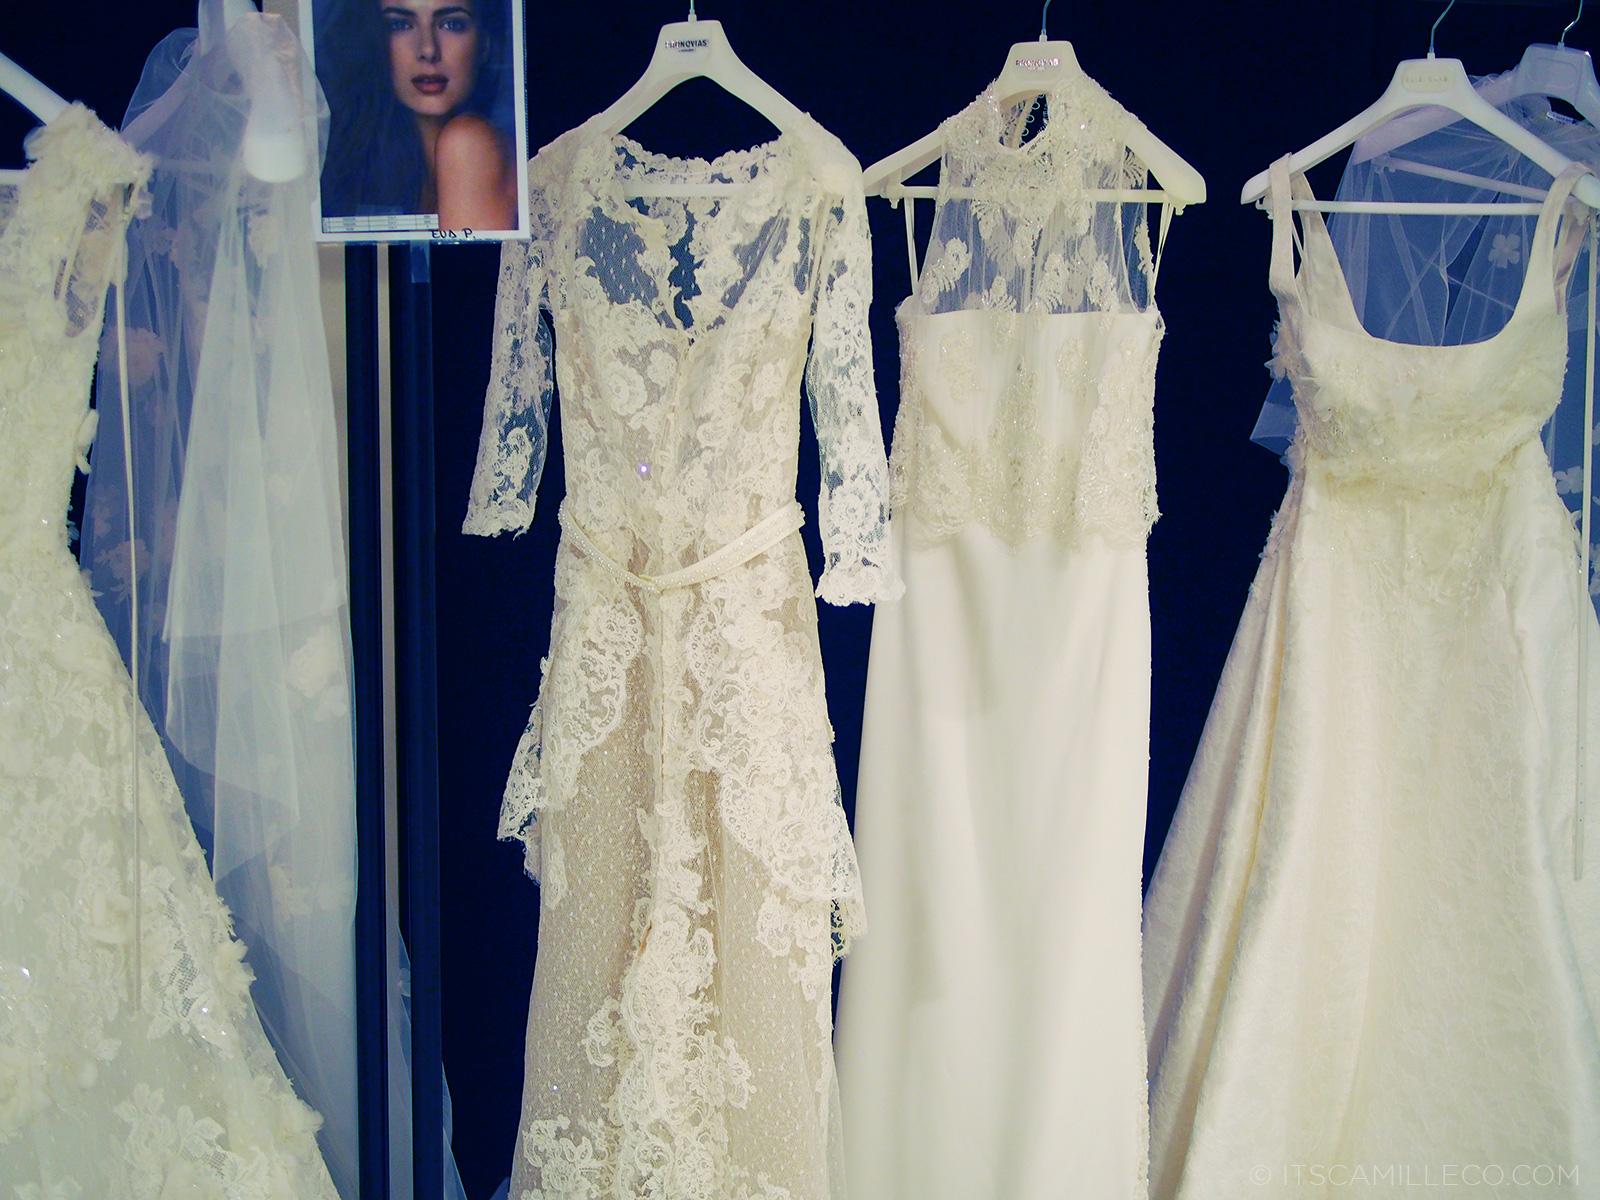 Camille Wedding Dress 94 Unique itscamilleco itscamilleco itscamilleco itscamilleco